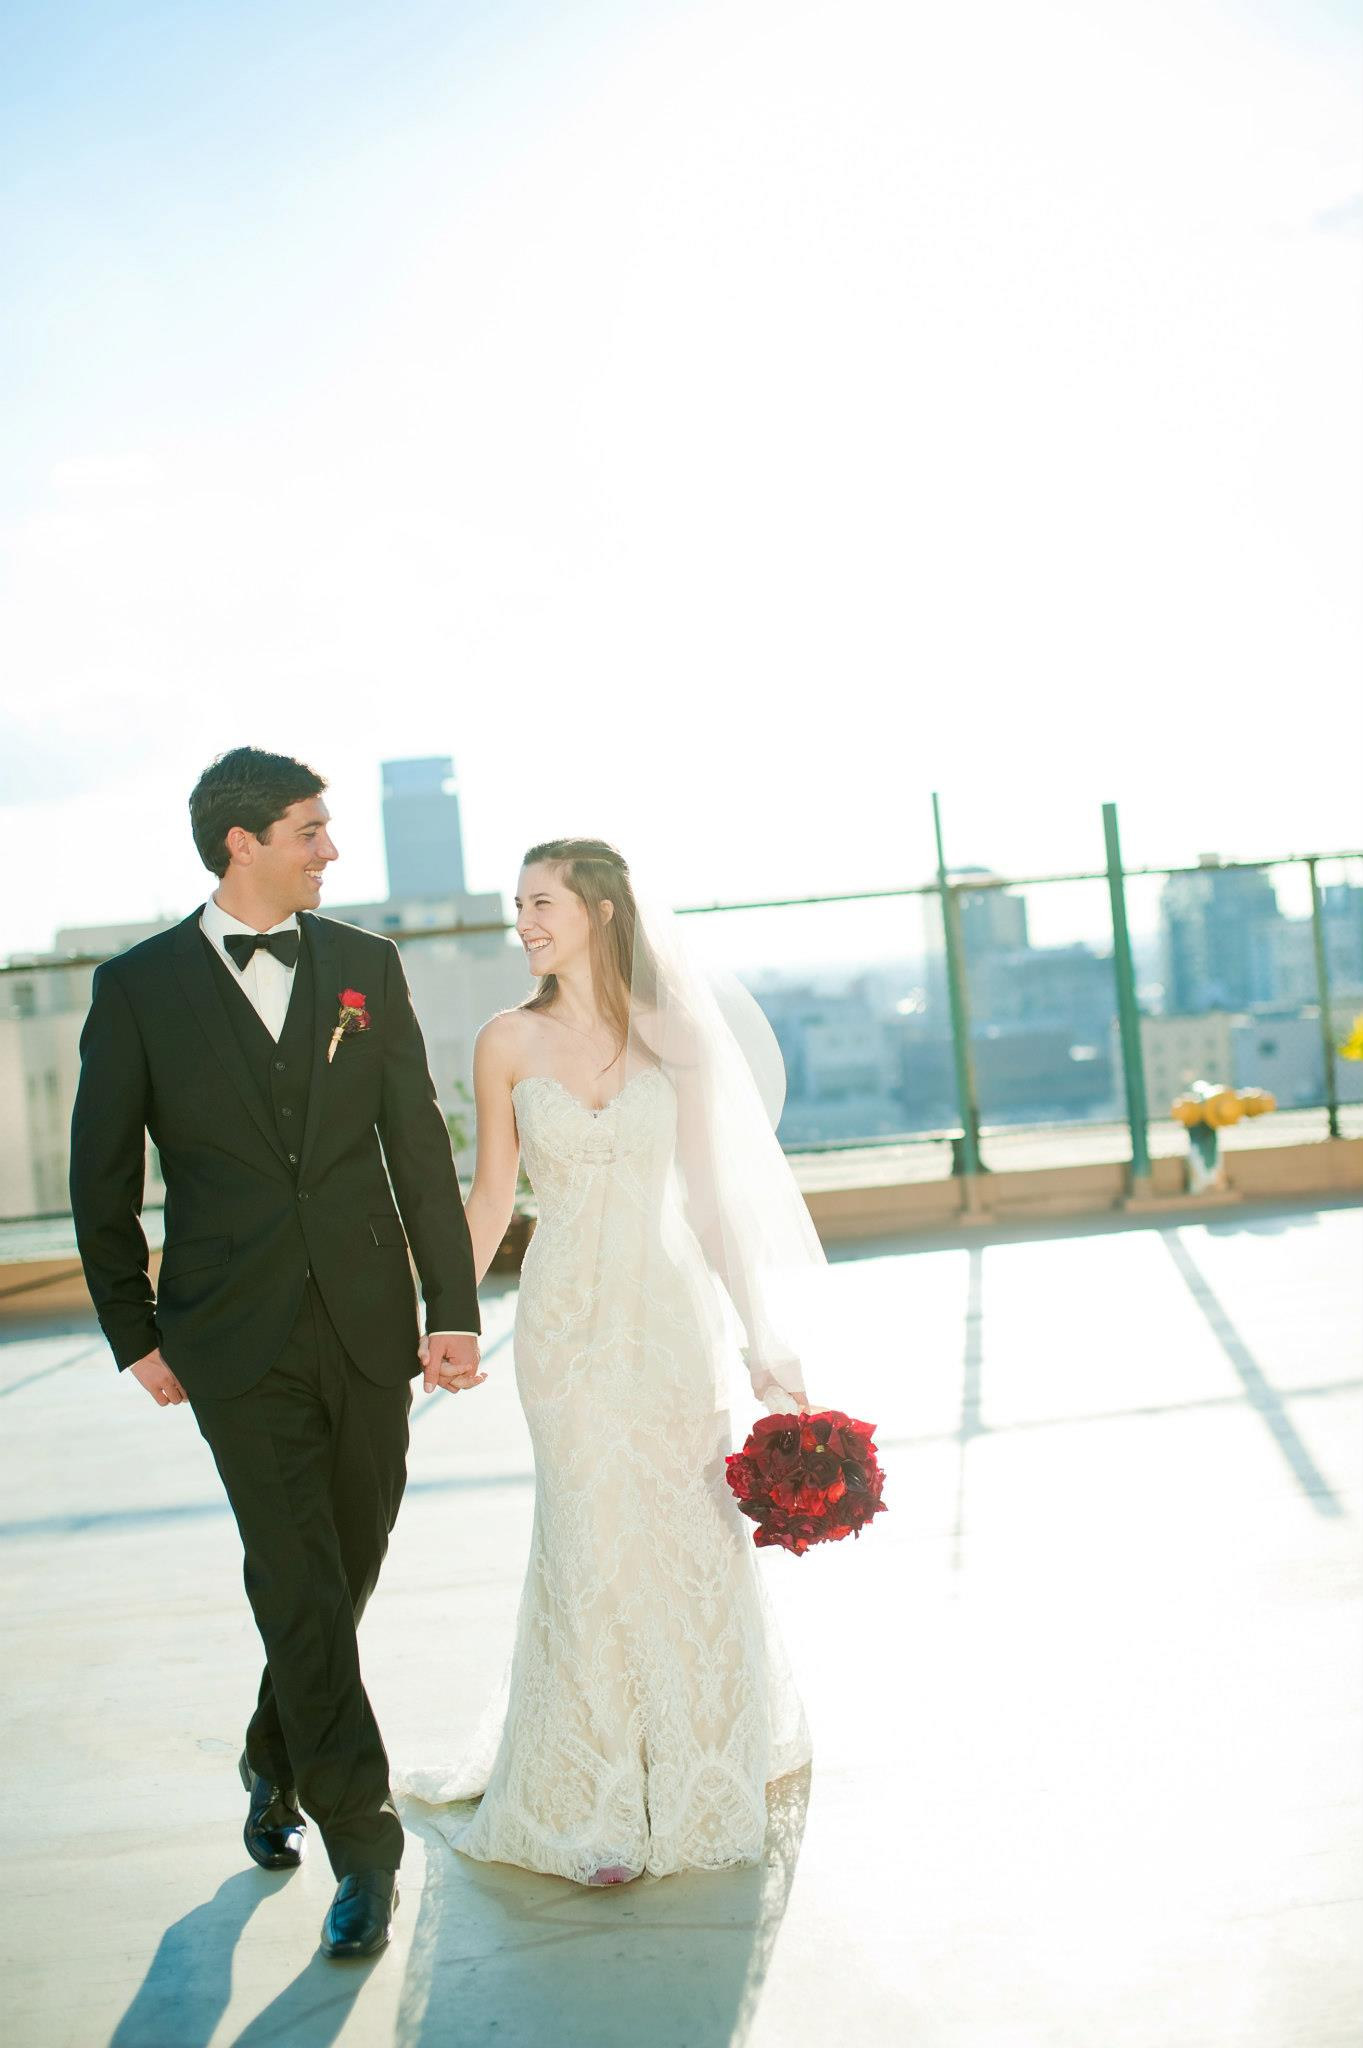 wandering_study_adventure_videographer_juan_turcios_wedding_photos_walking